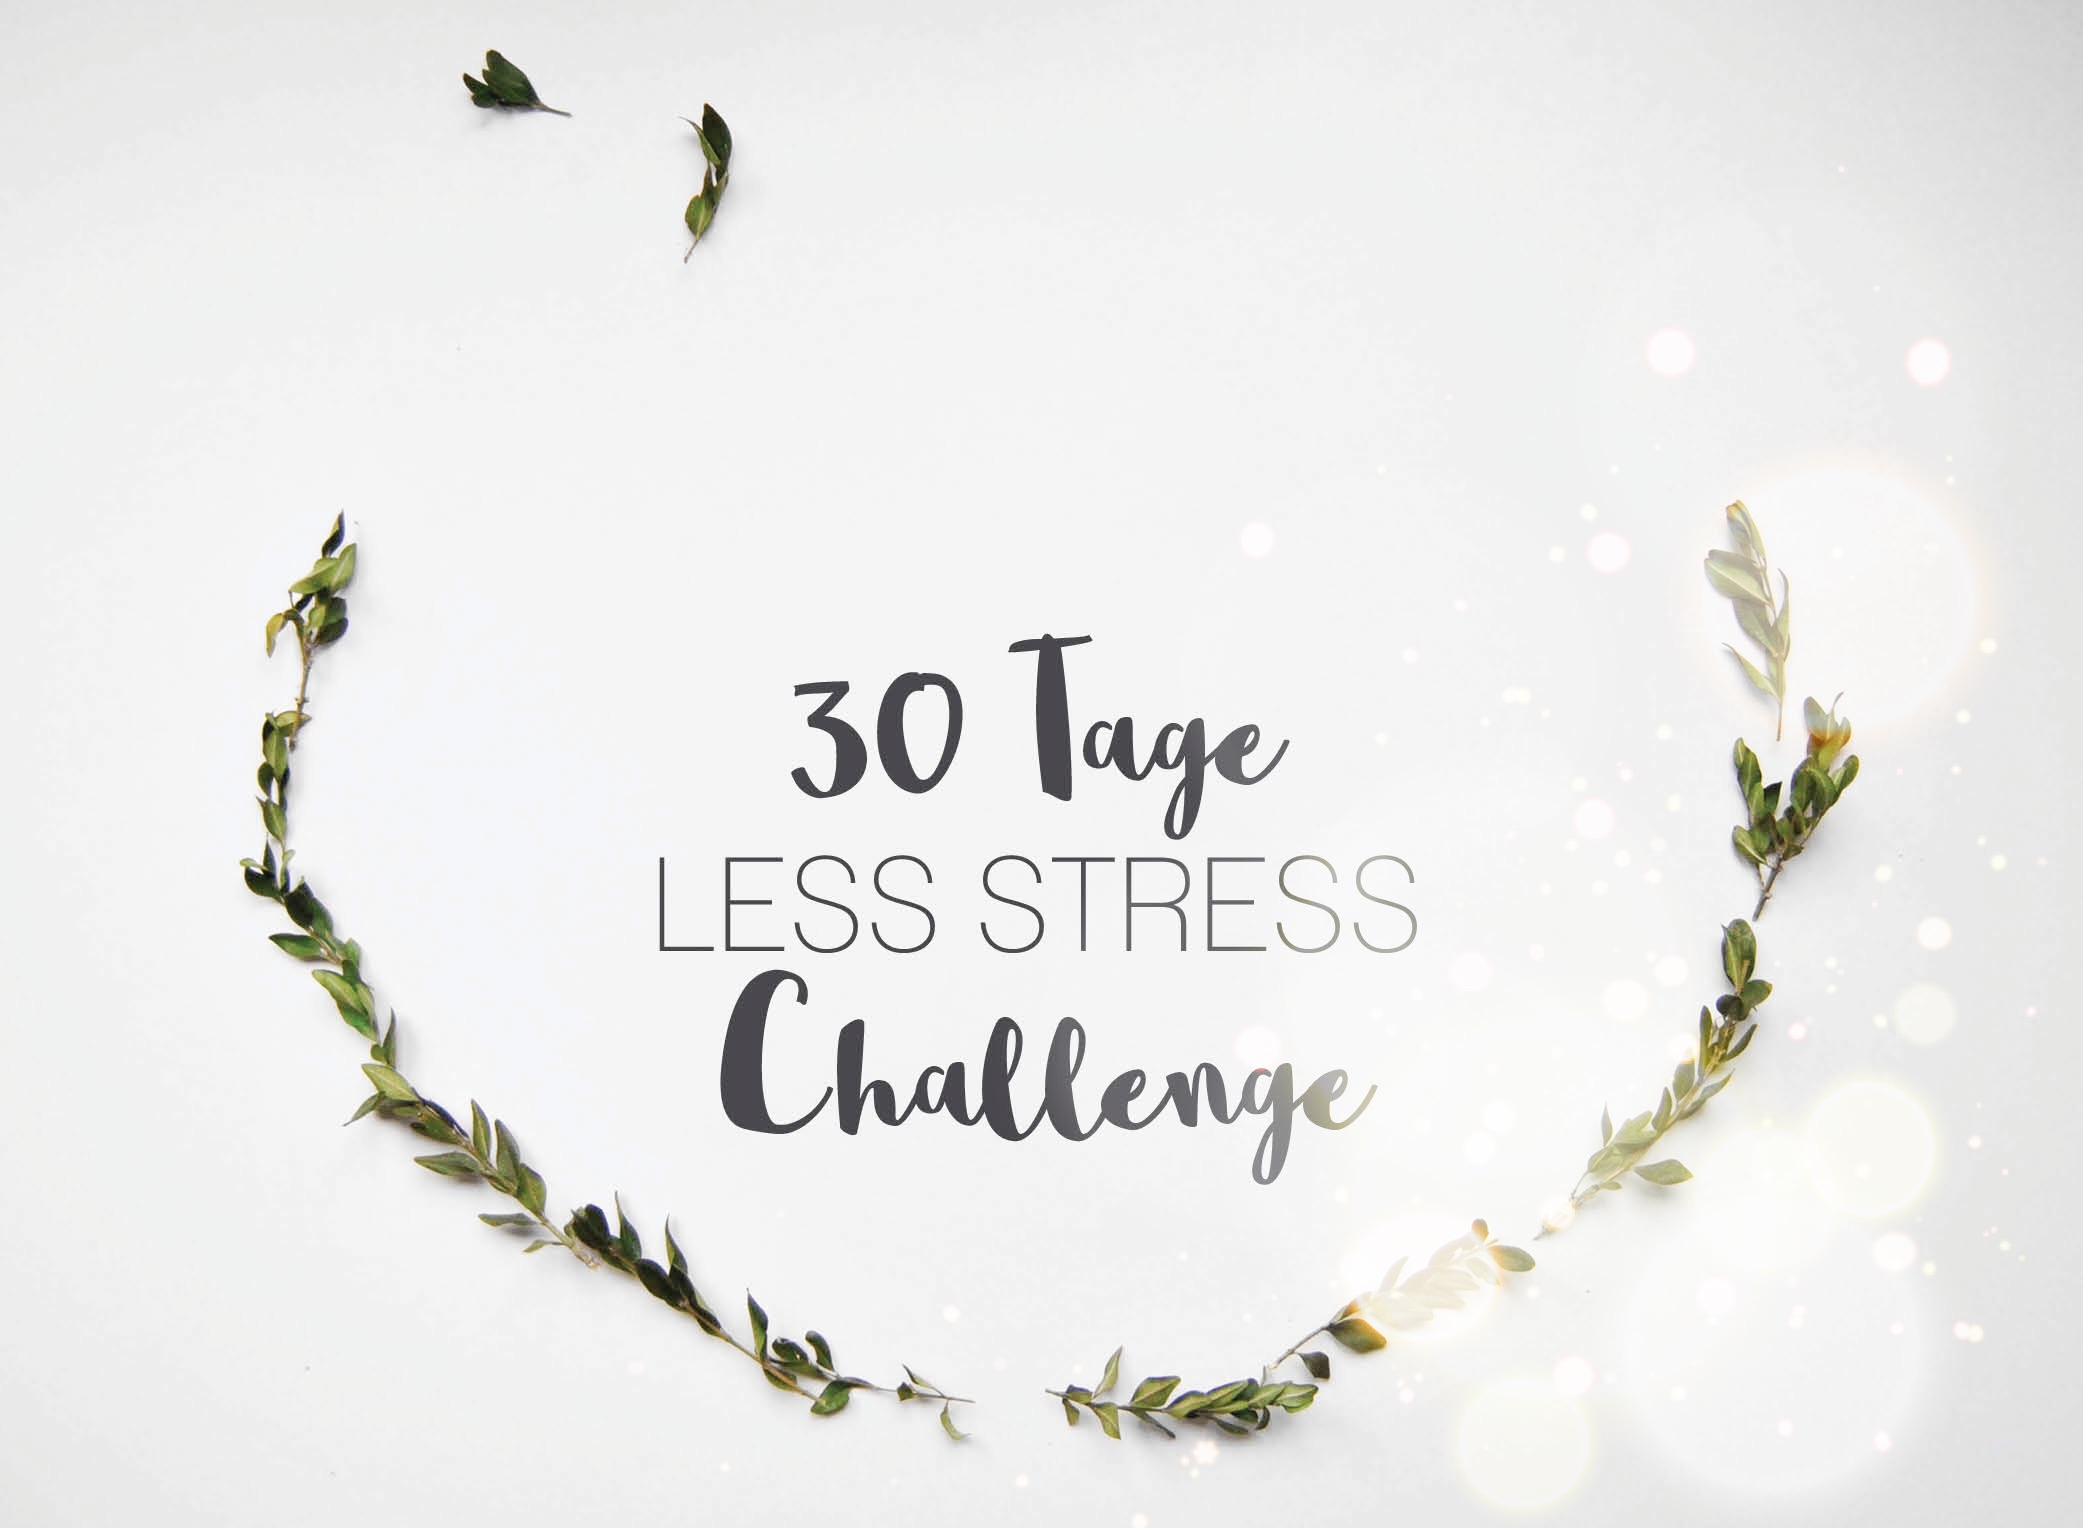 30 Tage Less Stress Challenge